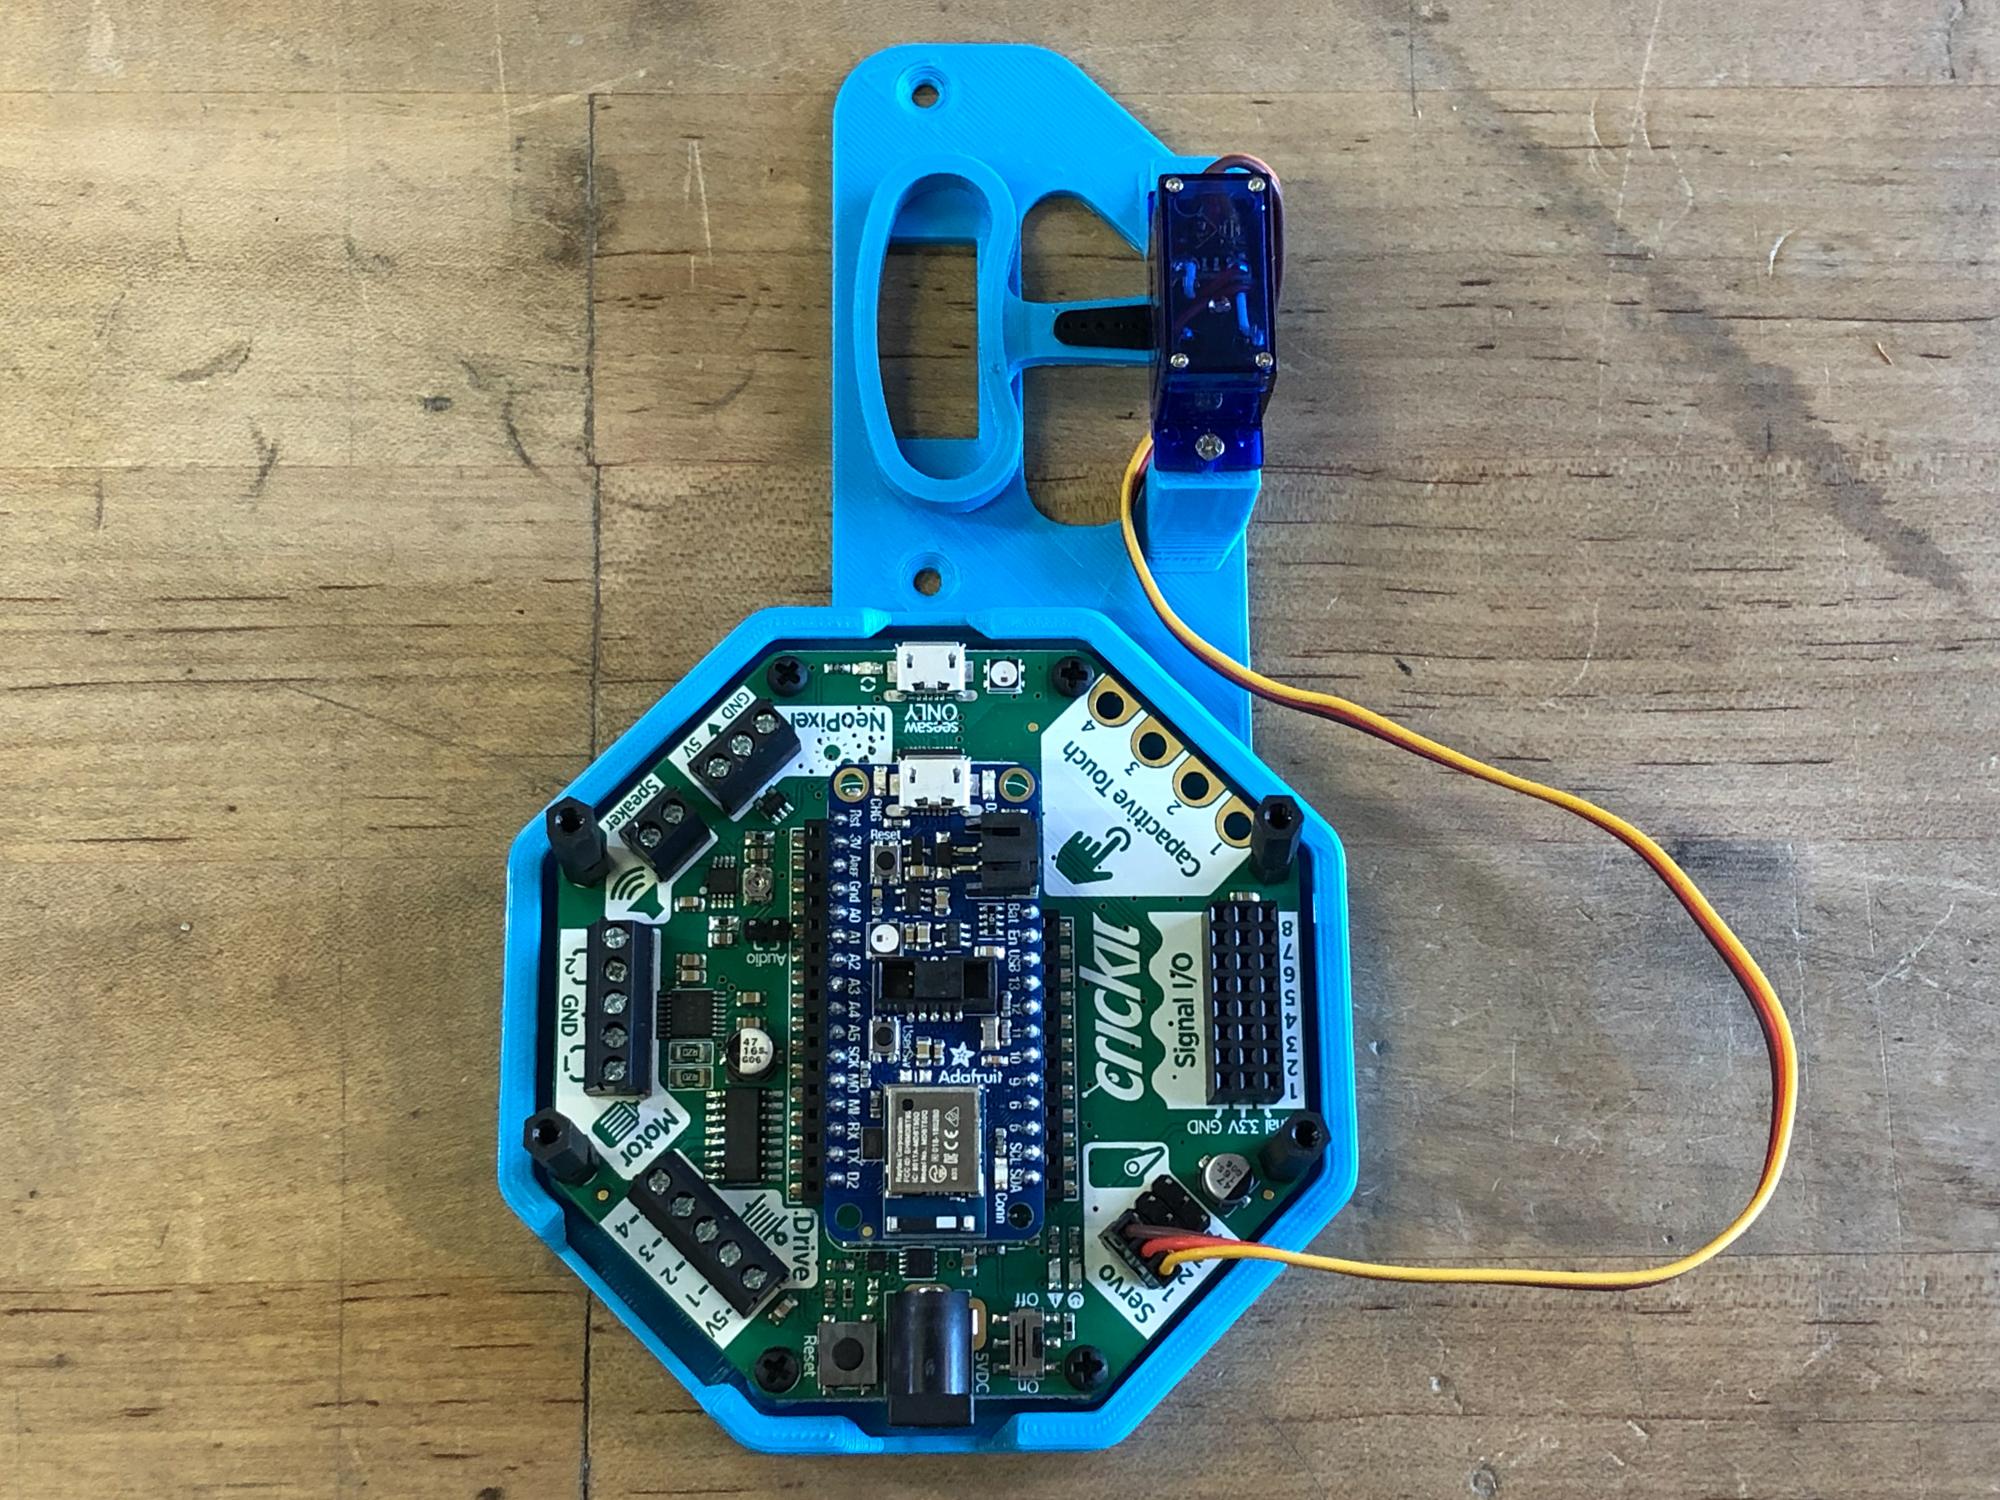 circuitpython_IMG_3973_2k.jpg